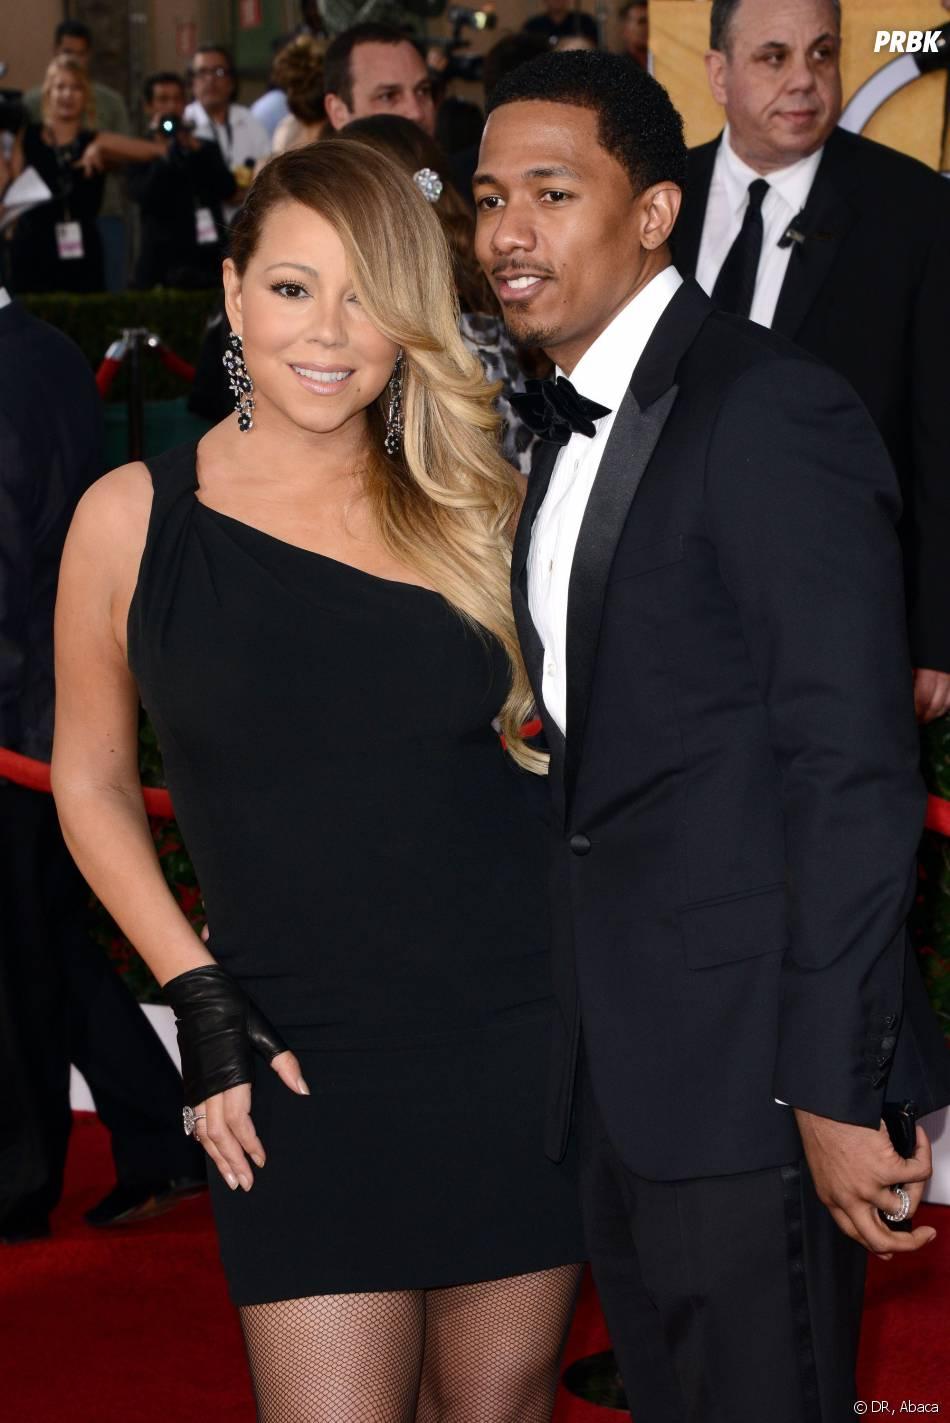 SAG Awards 2014 : Mariah Carey et son mari Nick Cannon à Los Angeles le samedi 18 janvier